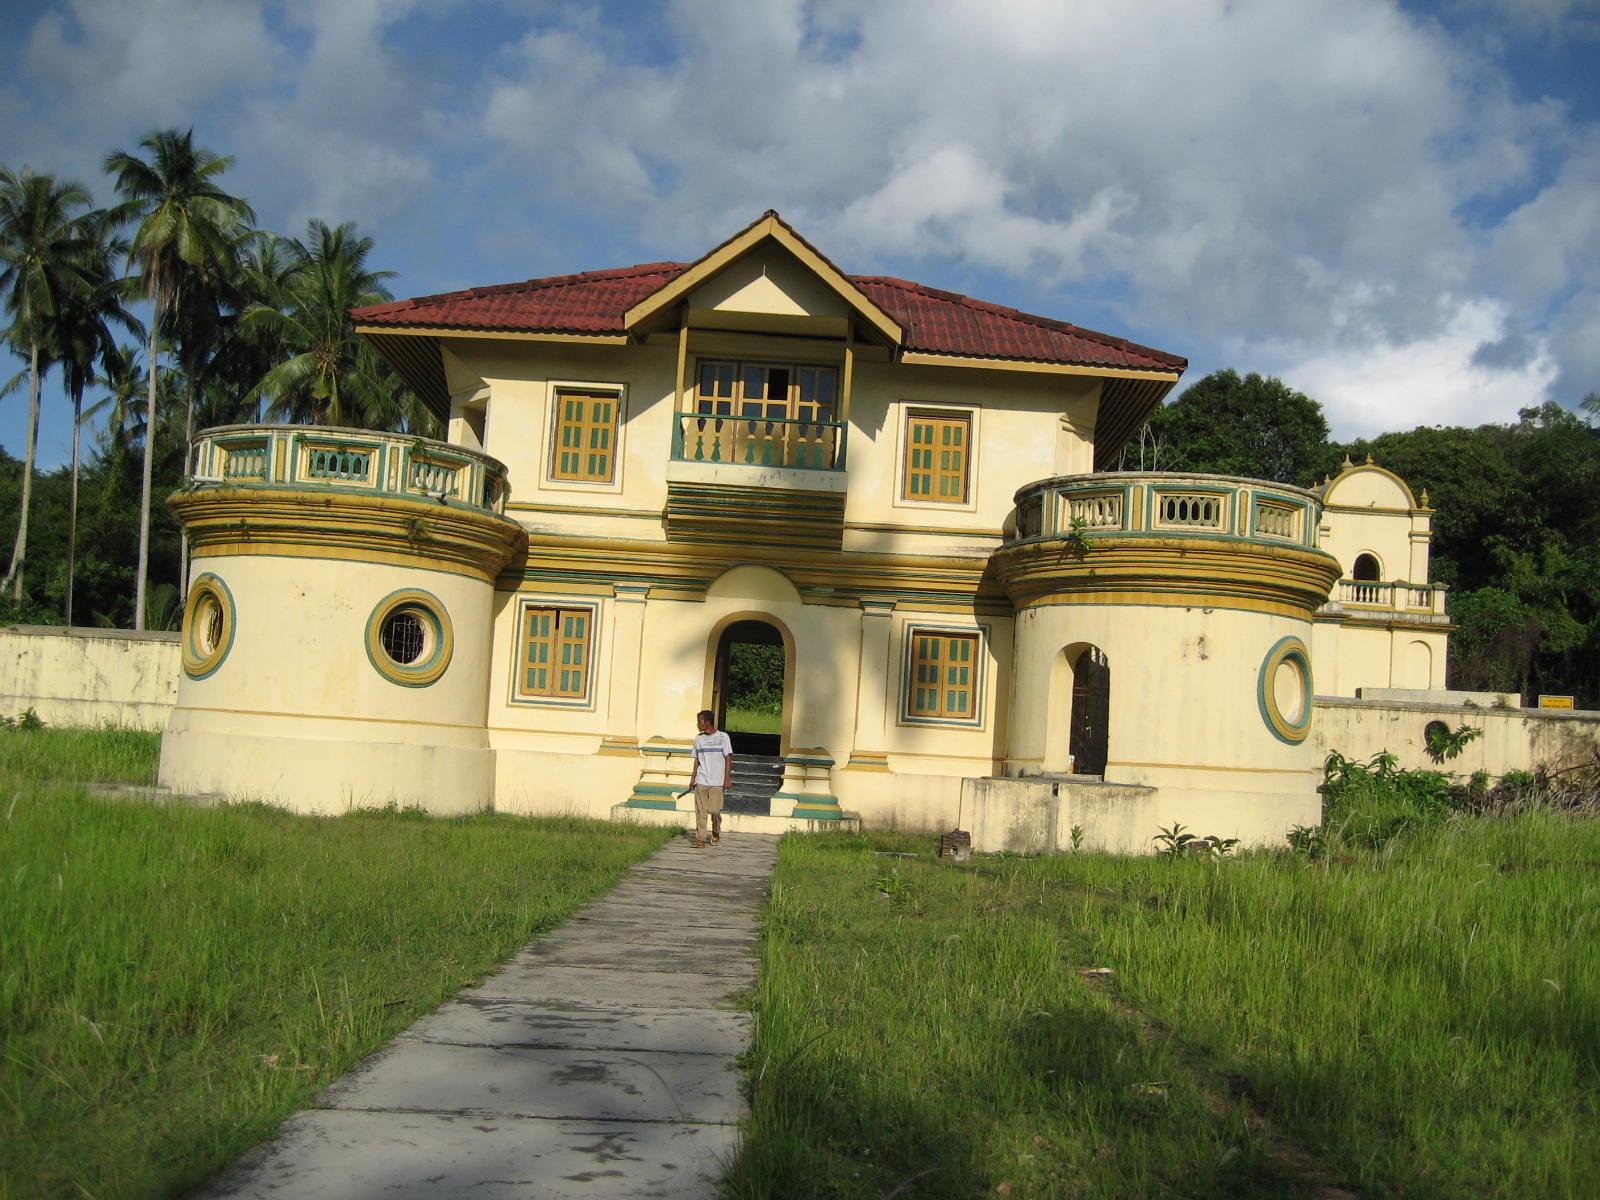 Interisti Indonesia Pulau Penyengat Inderasakti Sebutan Sumber Sejarah Sebuah Kecil